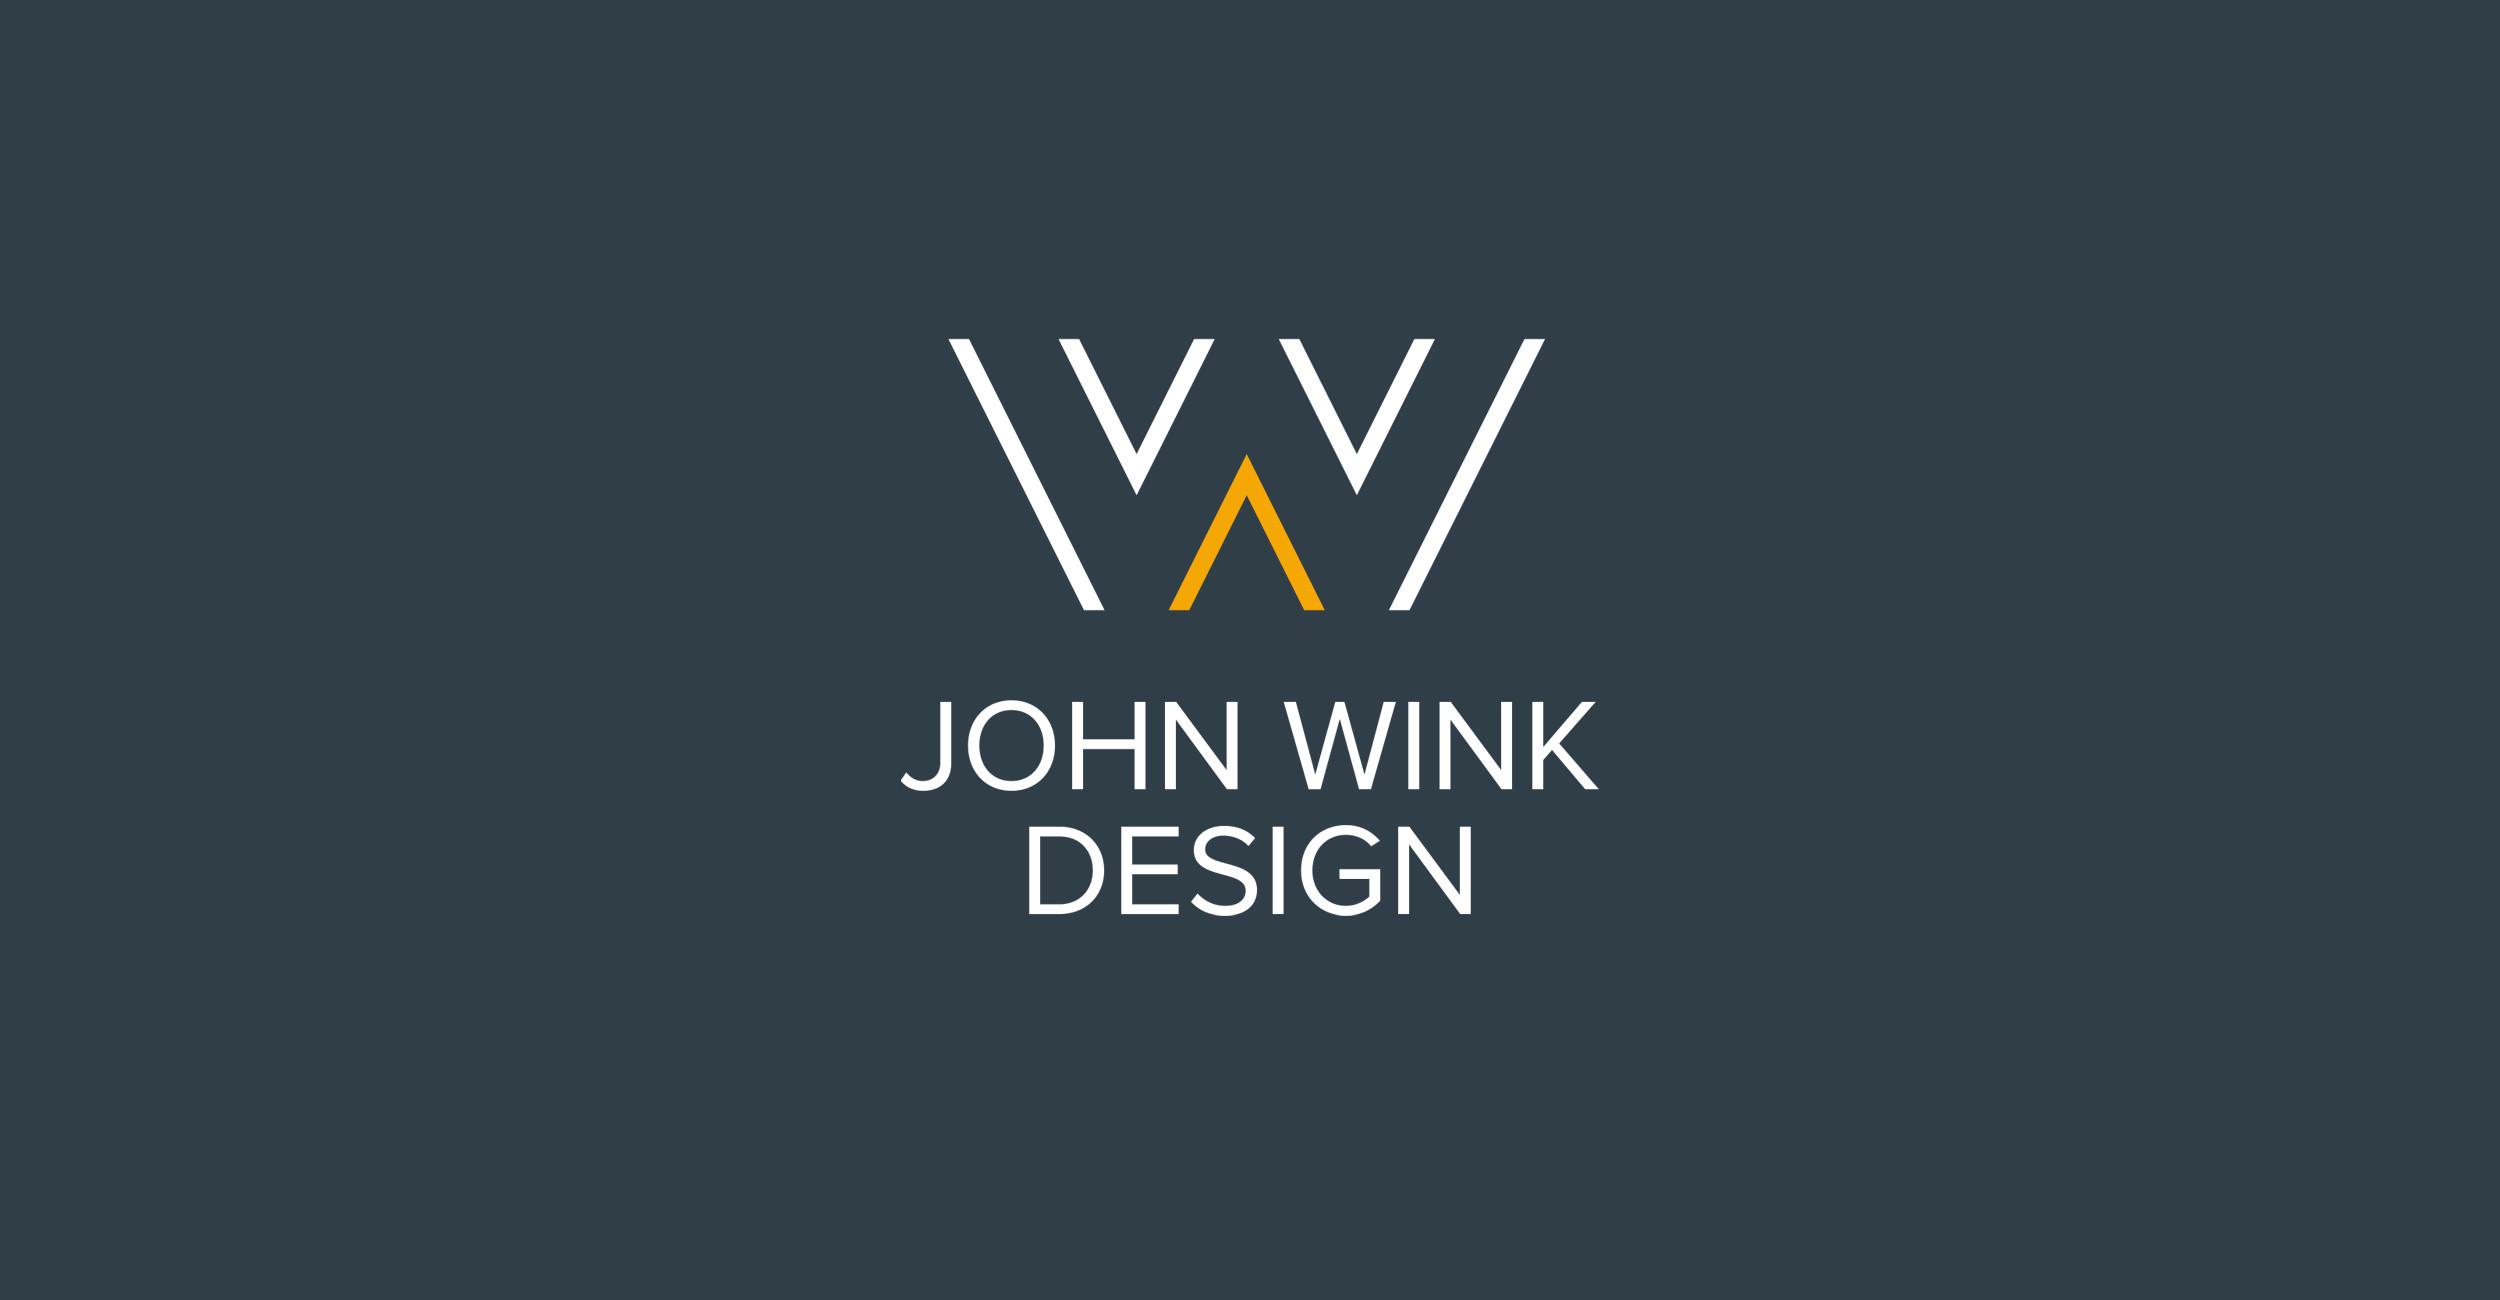 John Wink Design